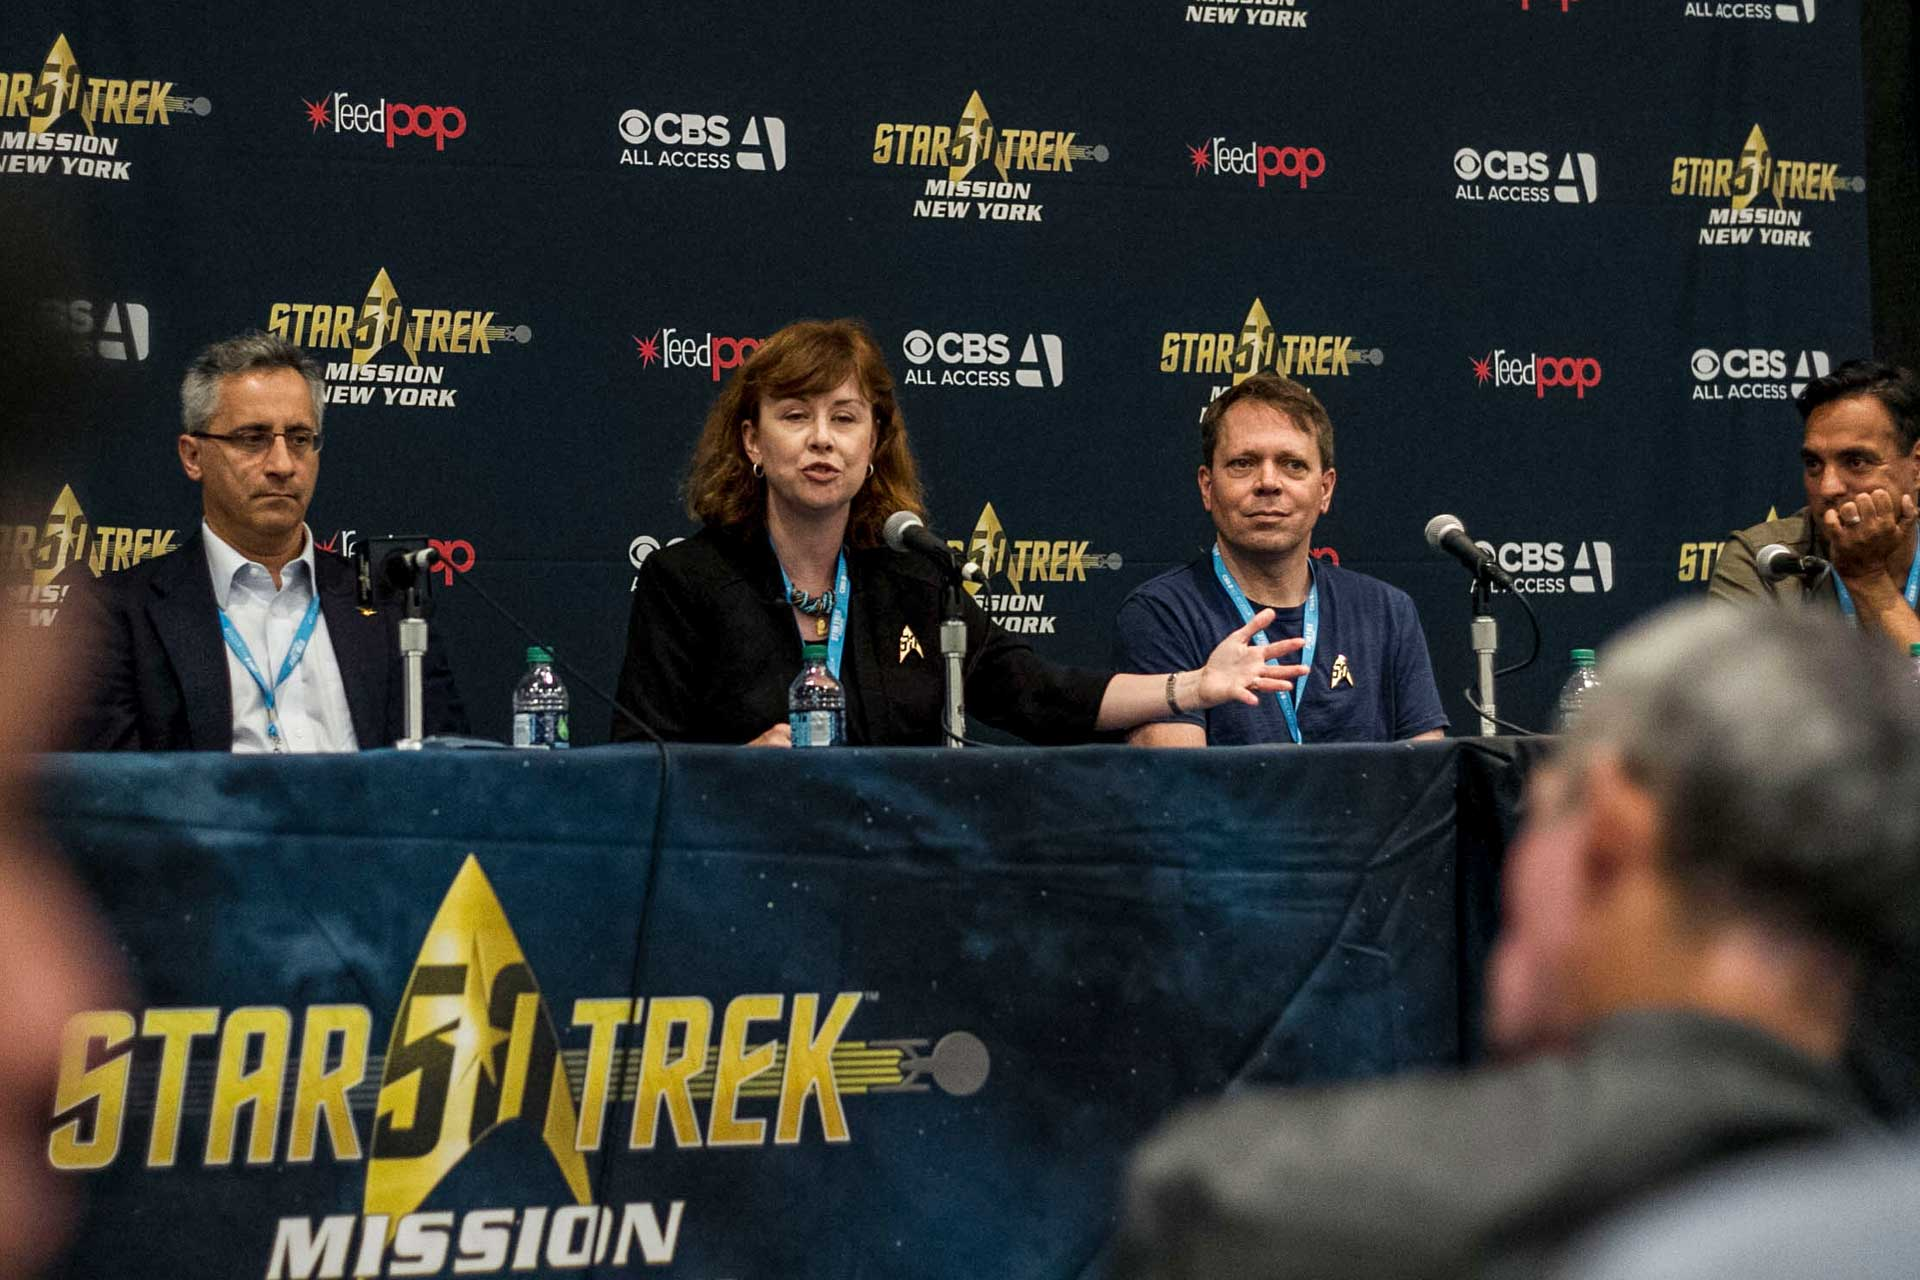 Start Trek press conference